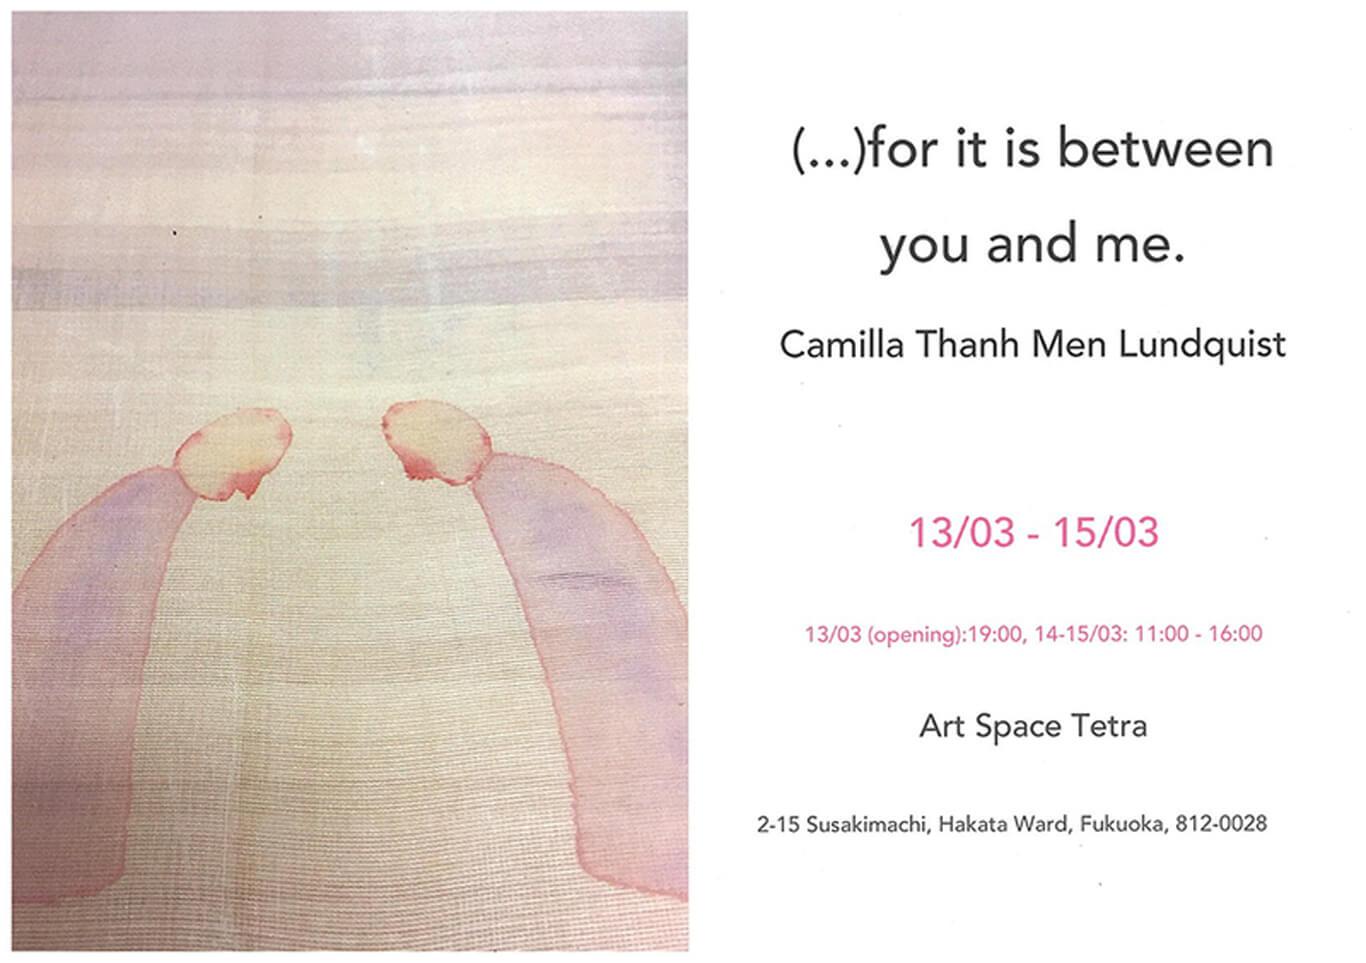 tetra-202003-Camilla Thanh Men Lundquist 個展1